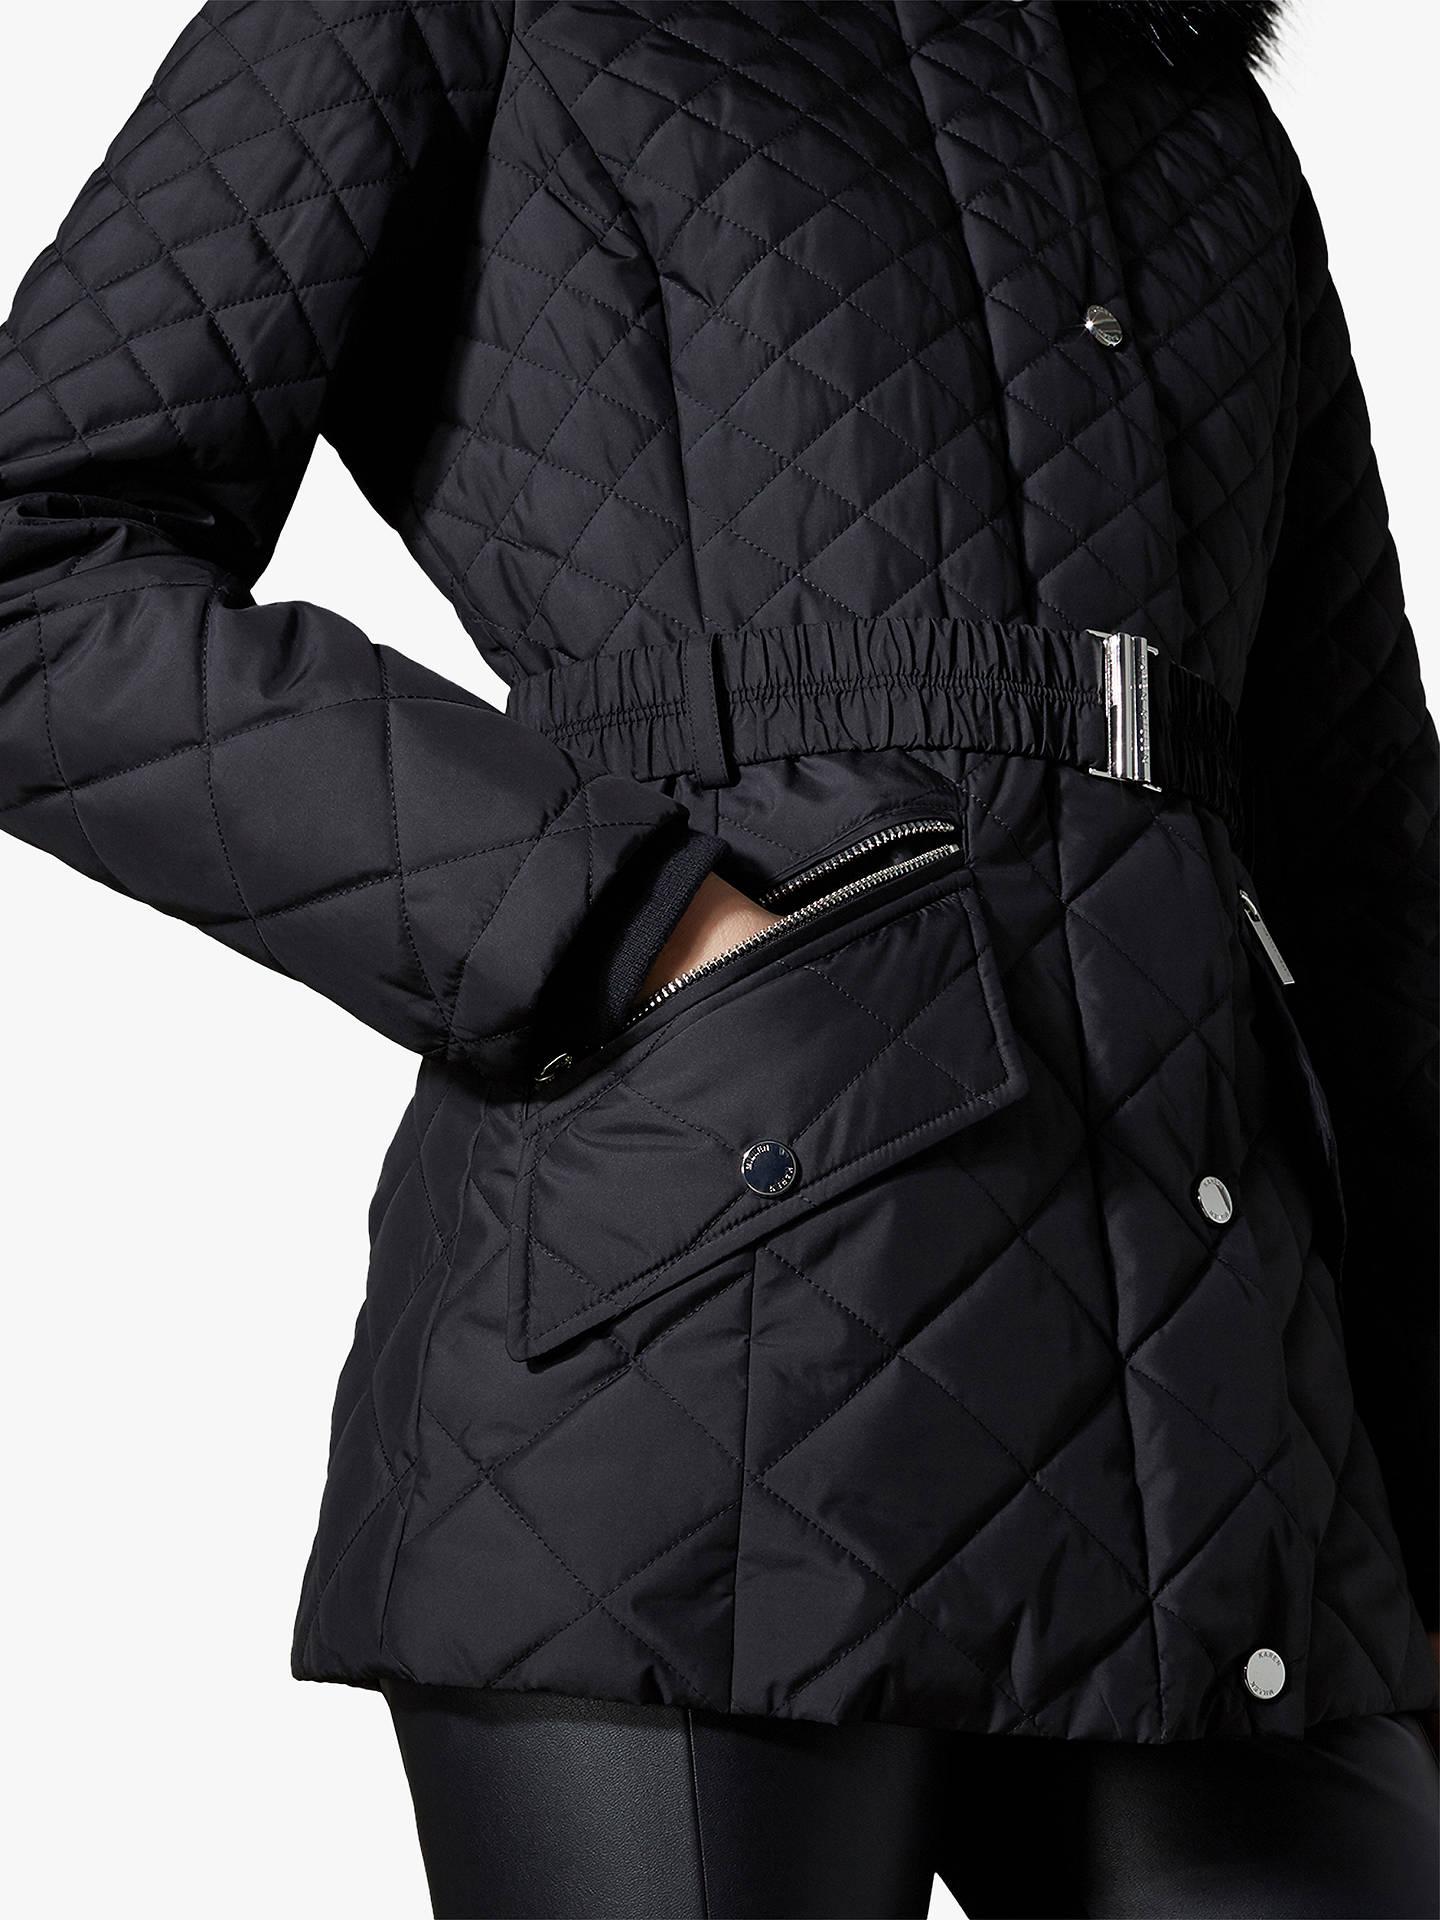 b973442e947 ... Buy Karen Millen Belted Puffer Coat, Black, 12 Online at johnlewis.com